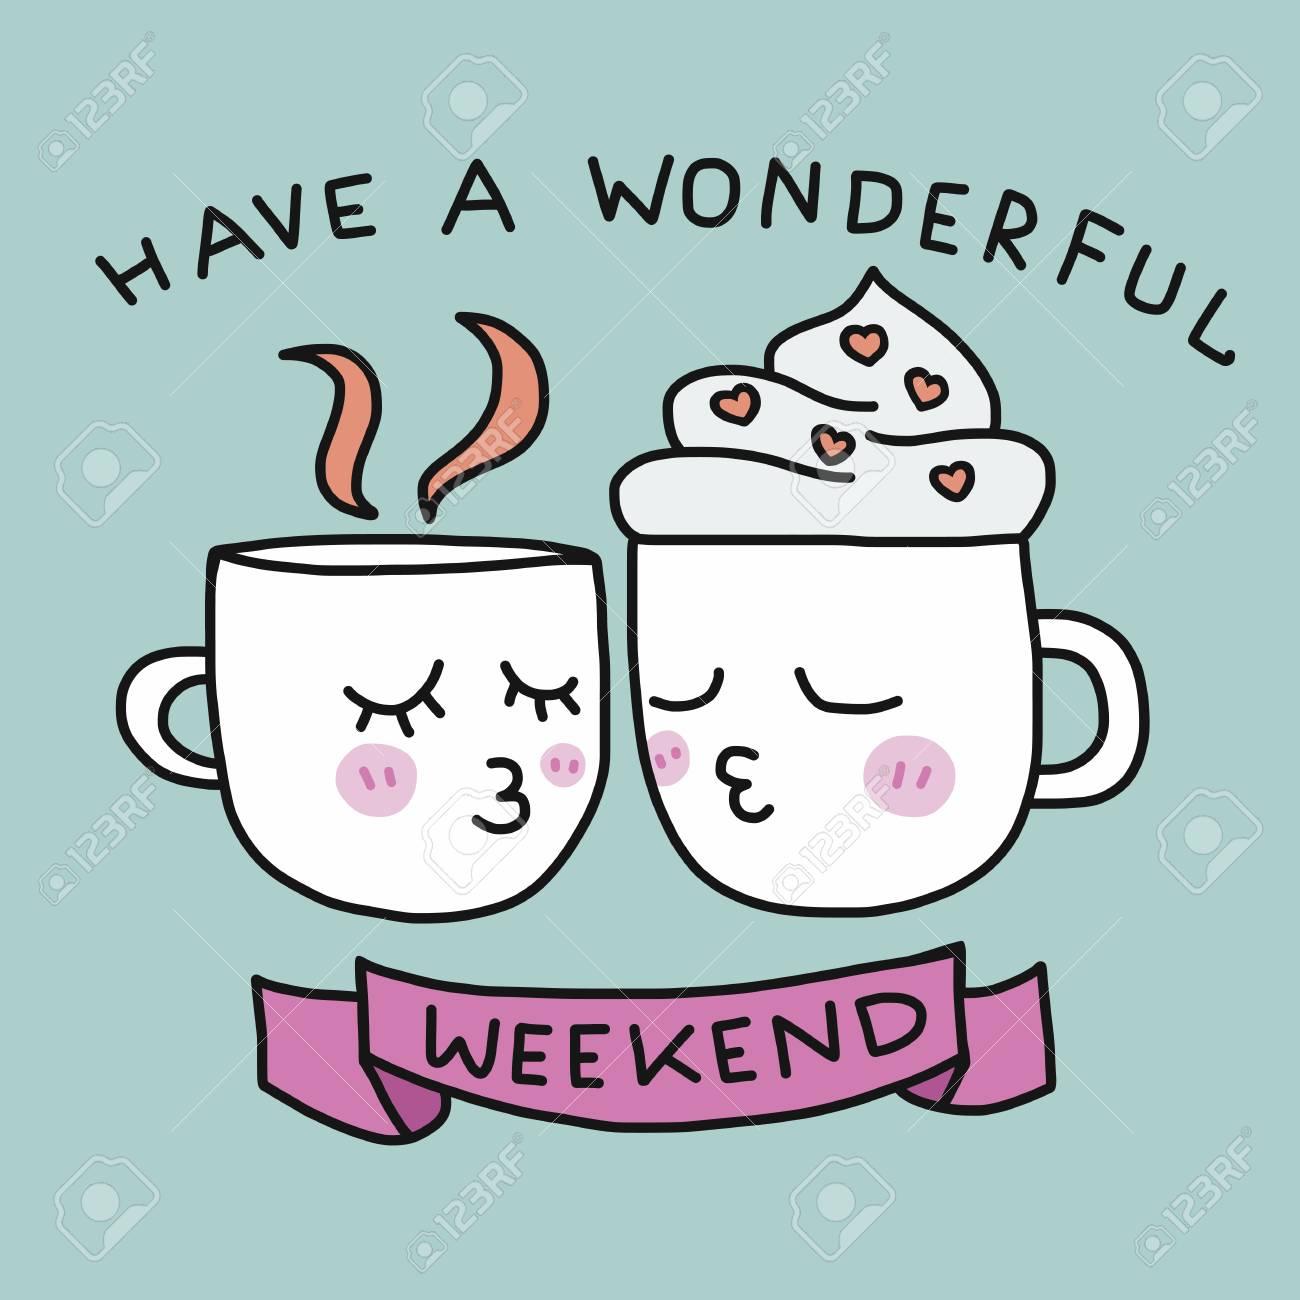 Have a wonderful weekend cute coffee cup kissing cartoon vector illustration - 104514932